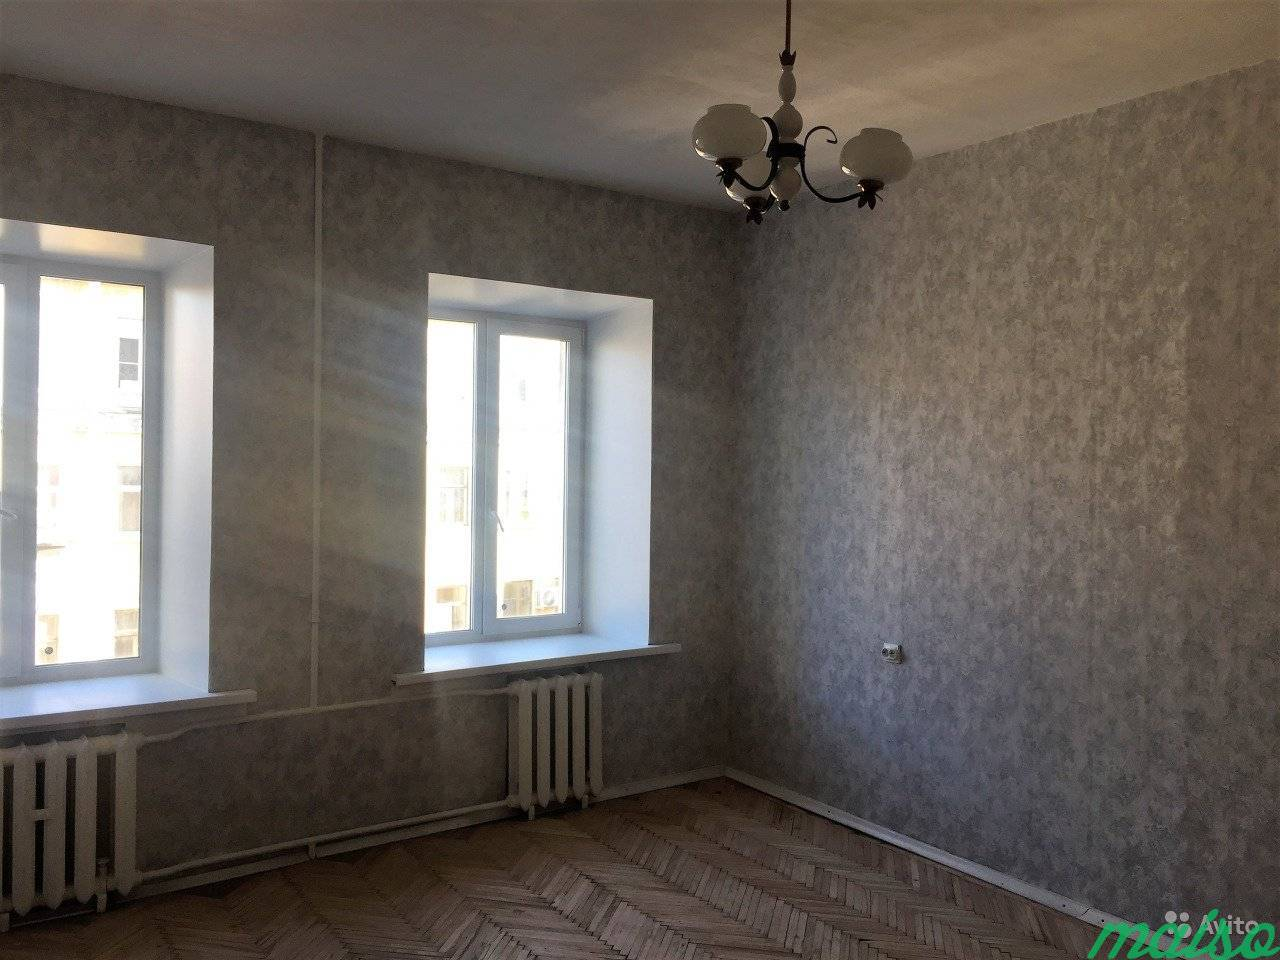 Комната 18.5 м² в 4-к, 5/6 эт. в Санкт-Петербурге. Фото 1